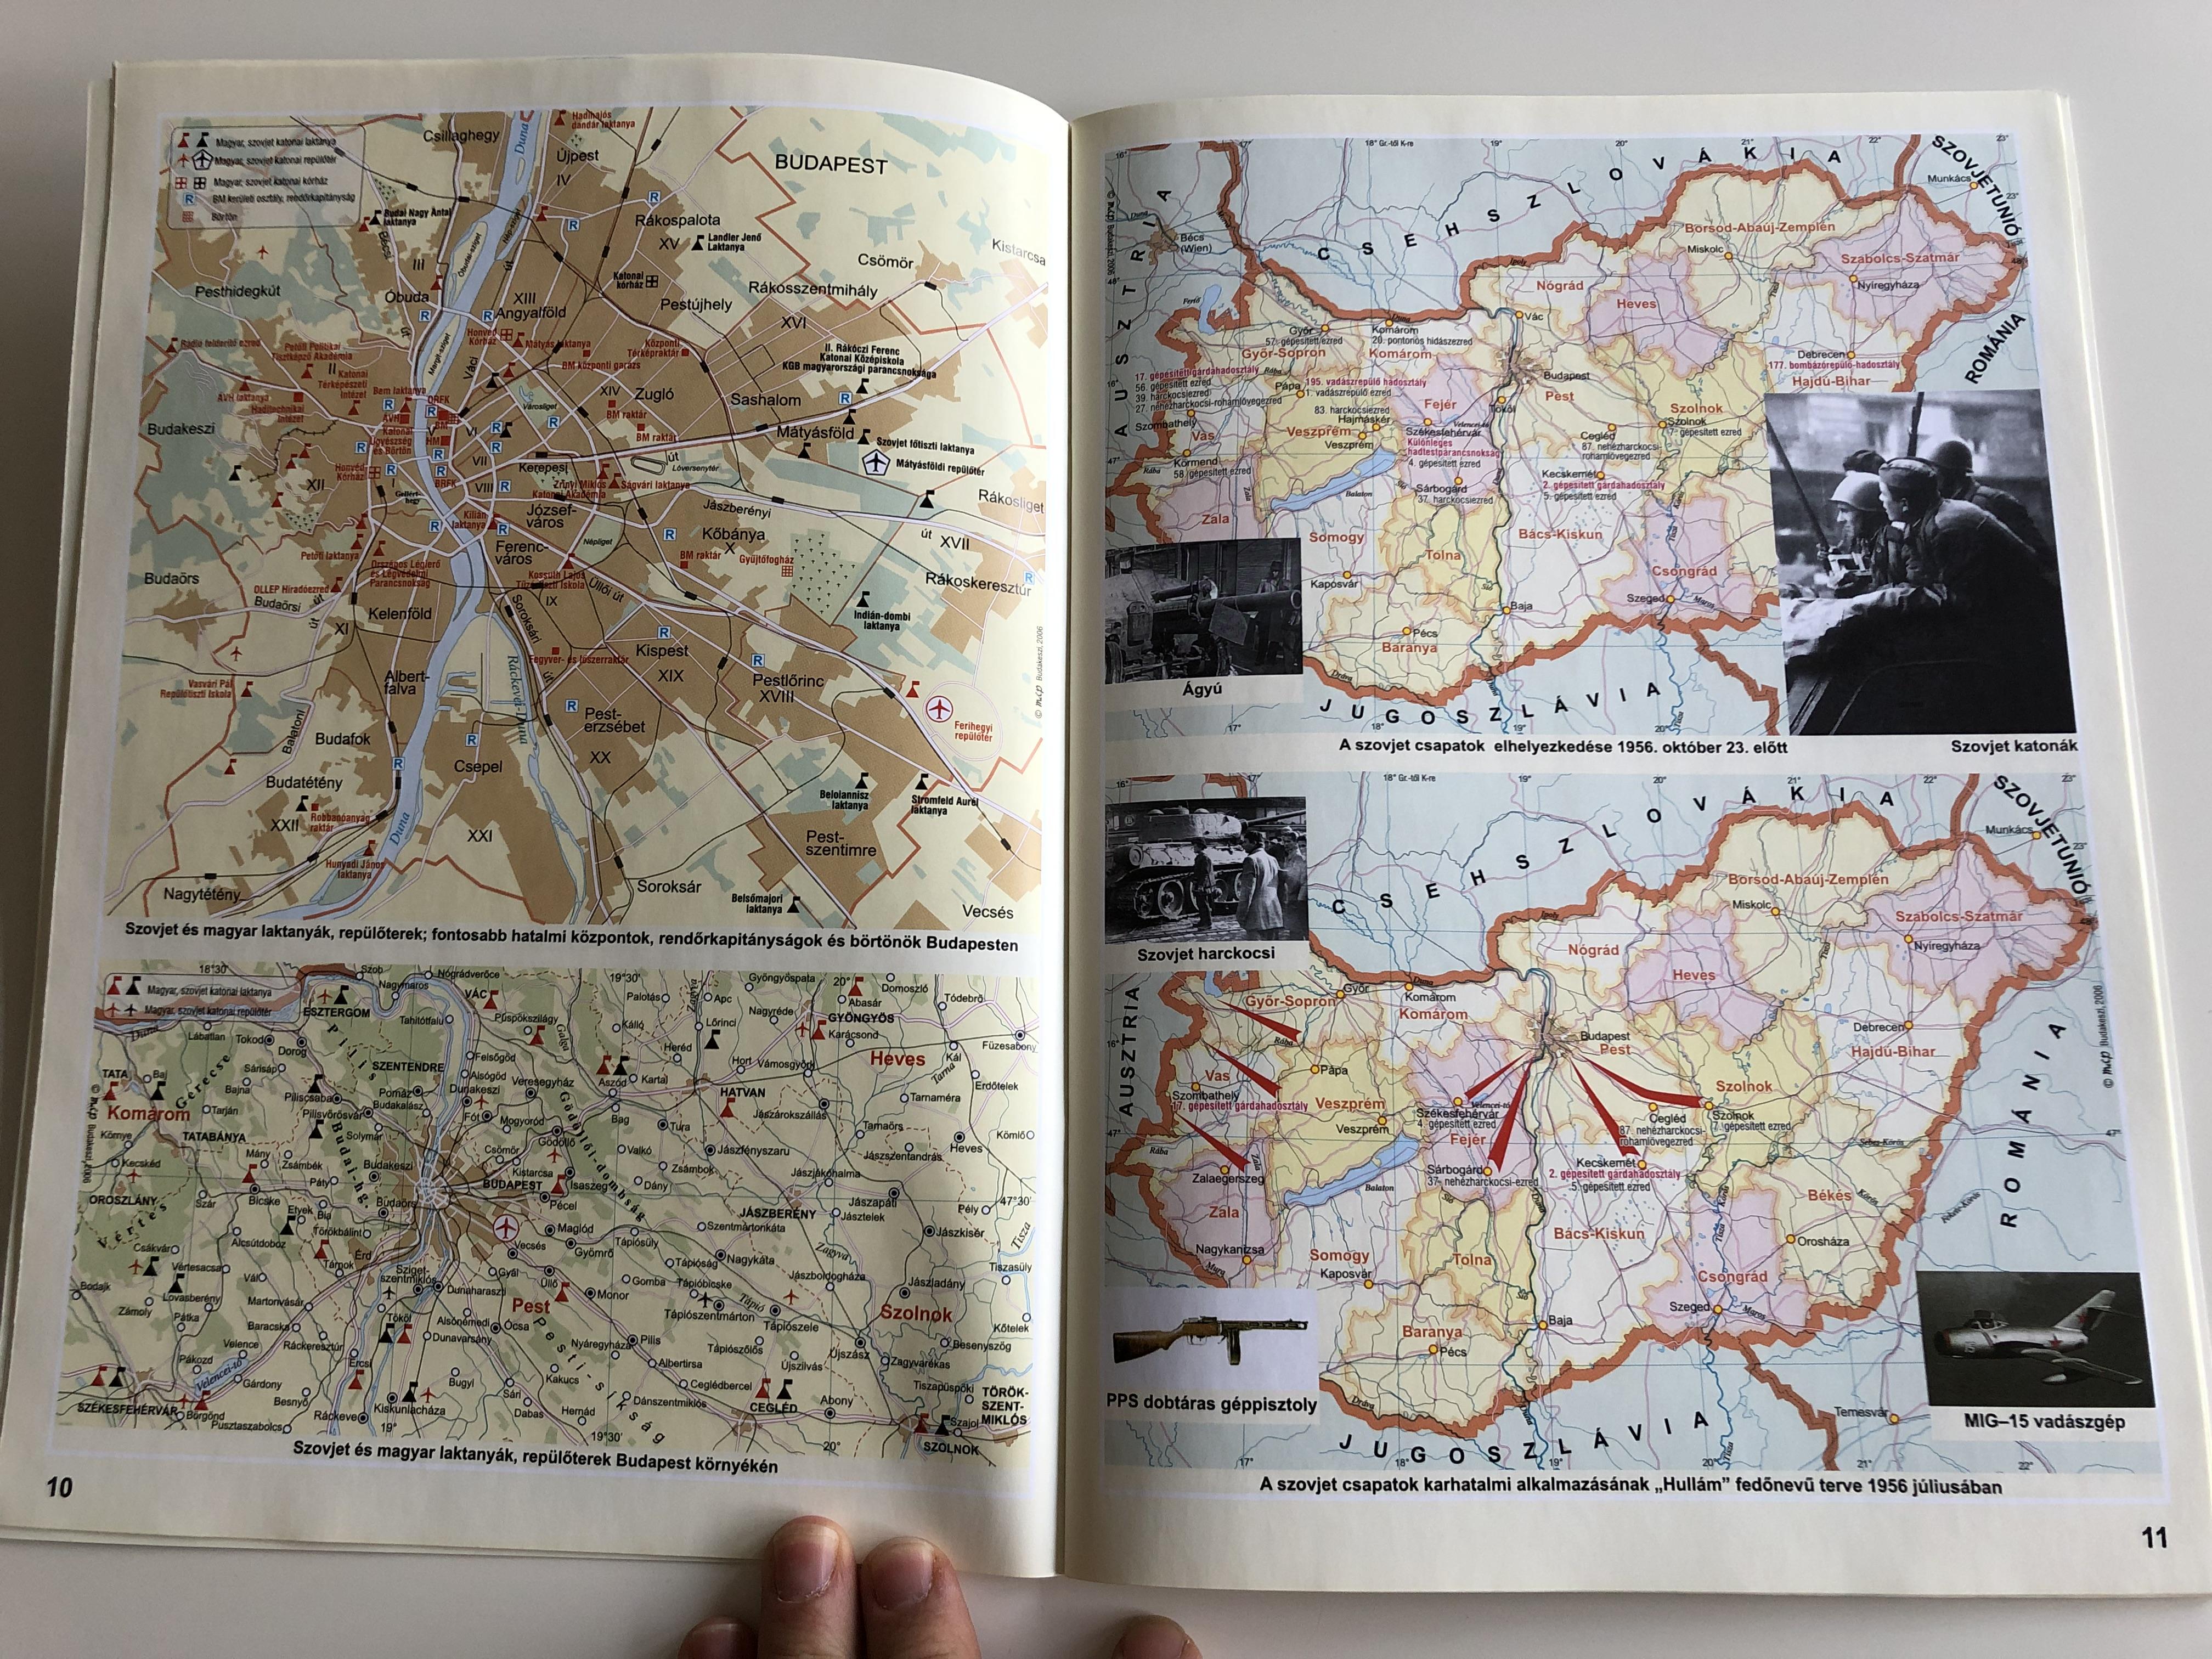 1956-esem-nyei-56-t-rk-peken-s-k-peken-t-rt-nelmi-atlas-the-events-of-1956-on-maps-and-photos-historical-atlas-2006-4-.jpg